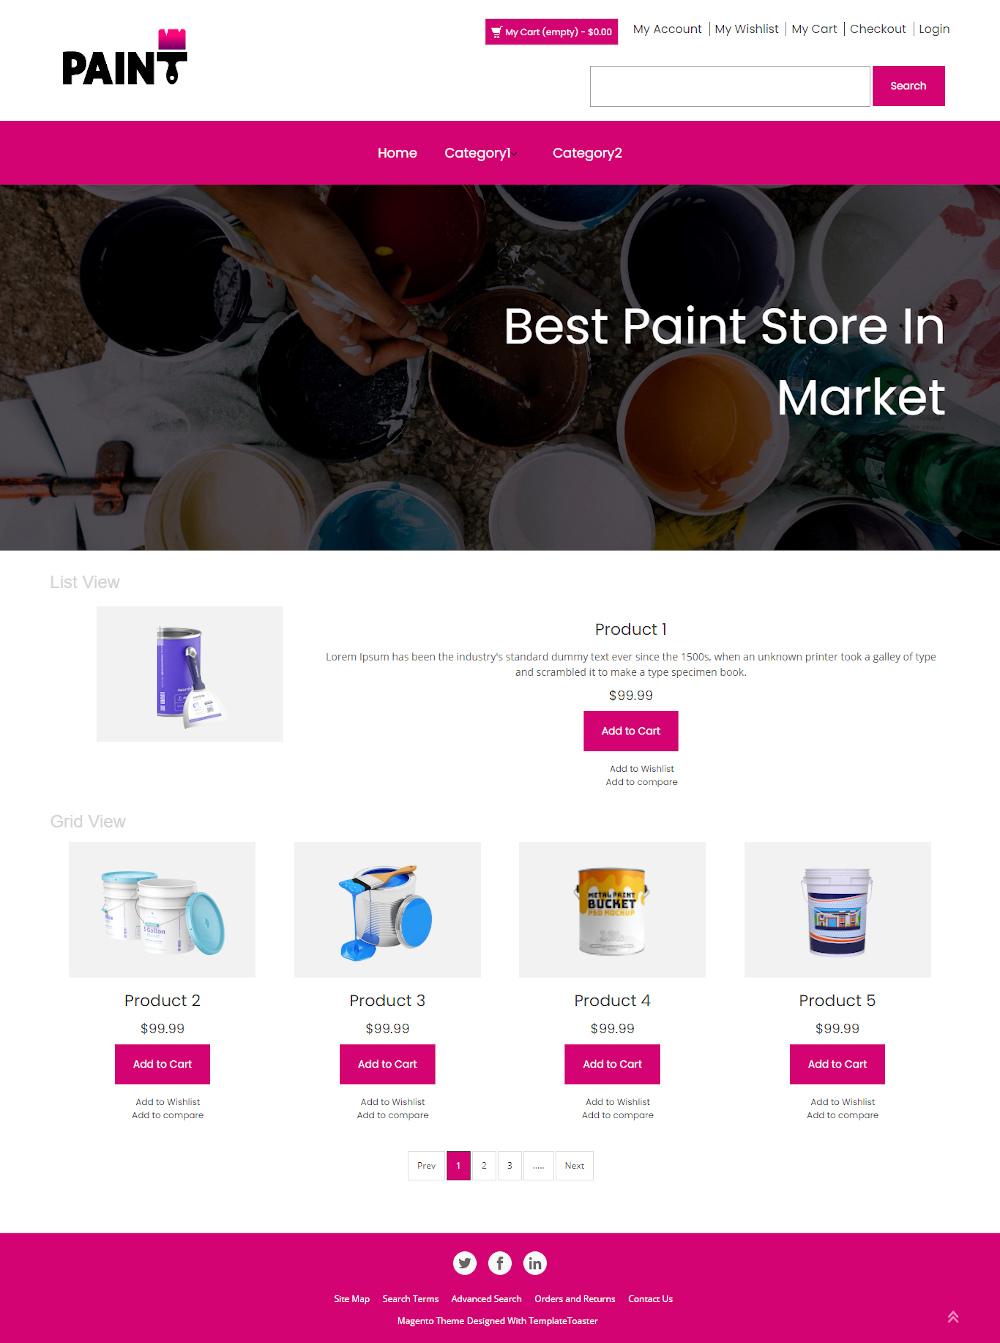 Paint - Online Paint Store Magento Theme